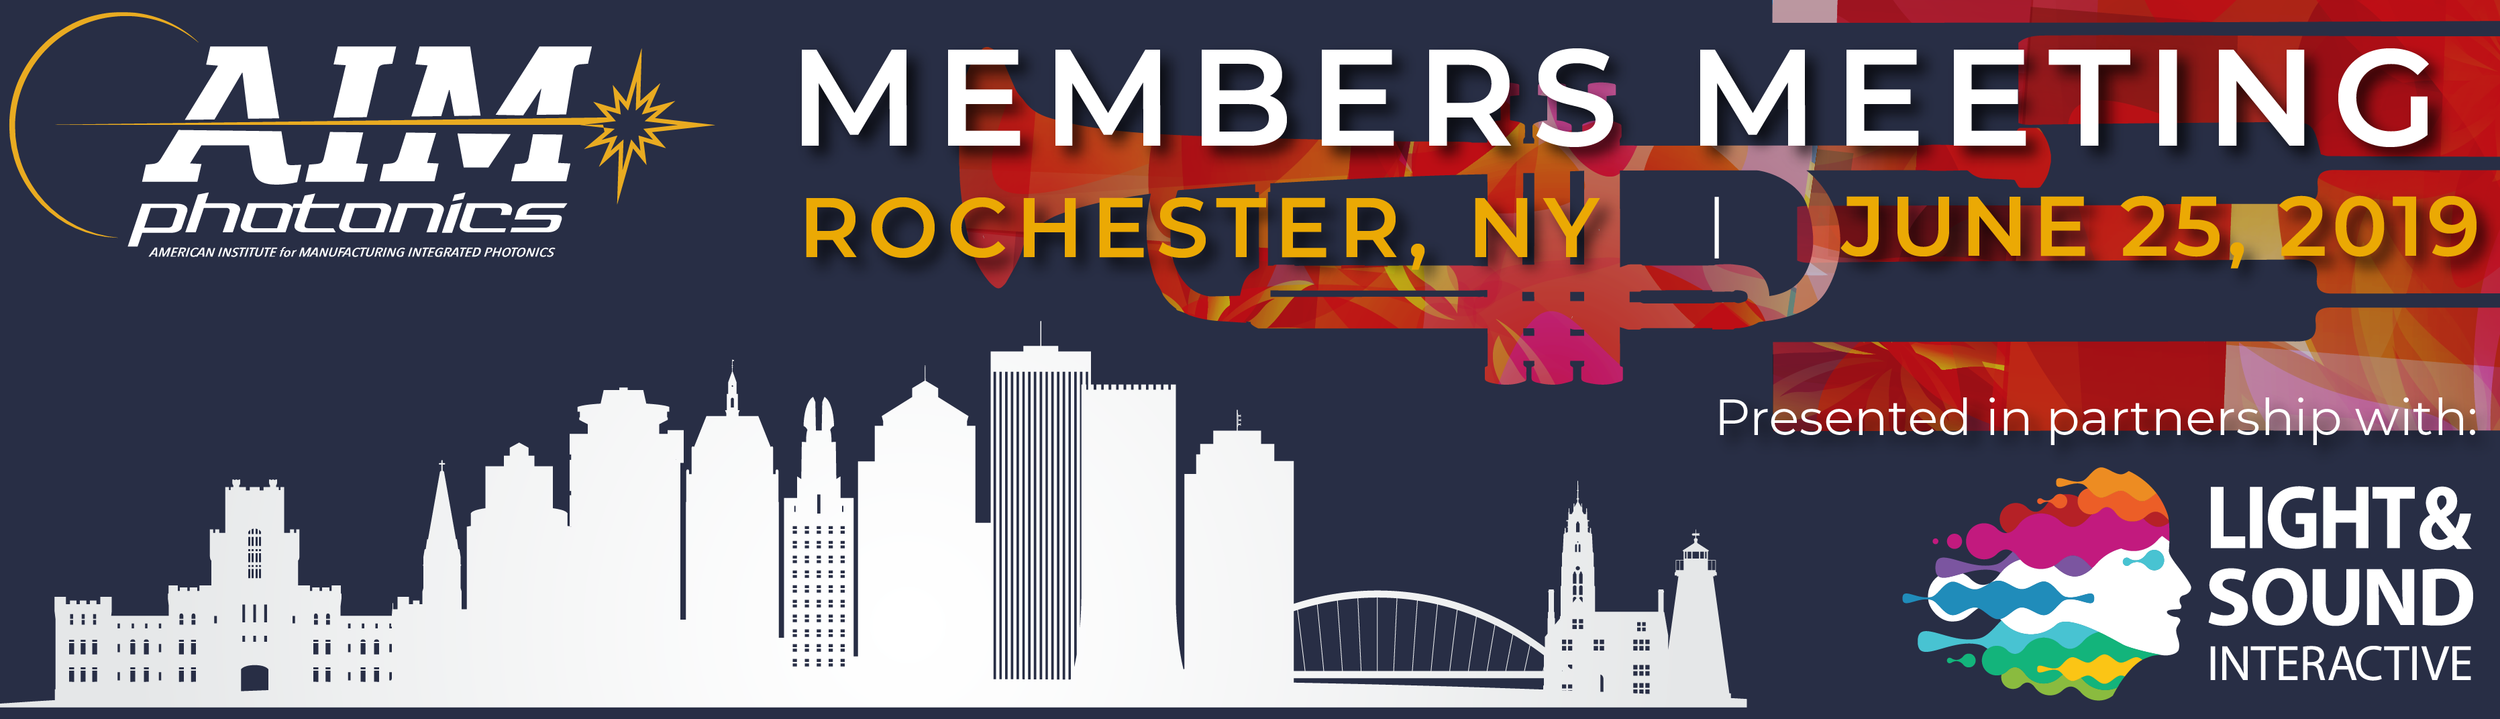 Rochester Convention Center - 123 E Main St, Rochester, NY 14604